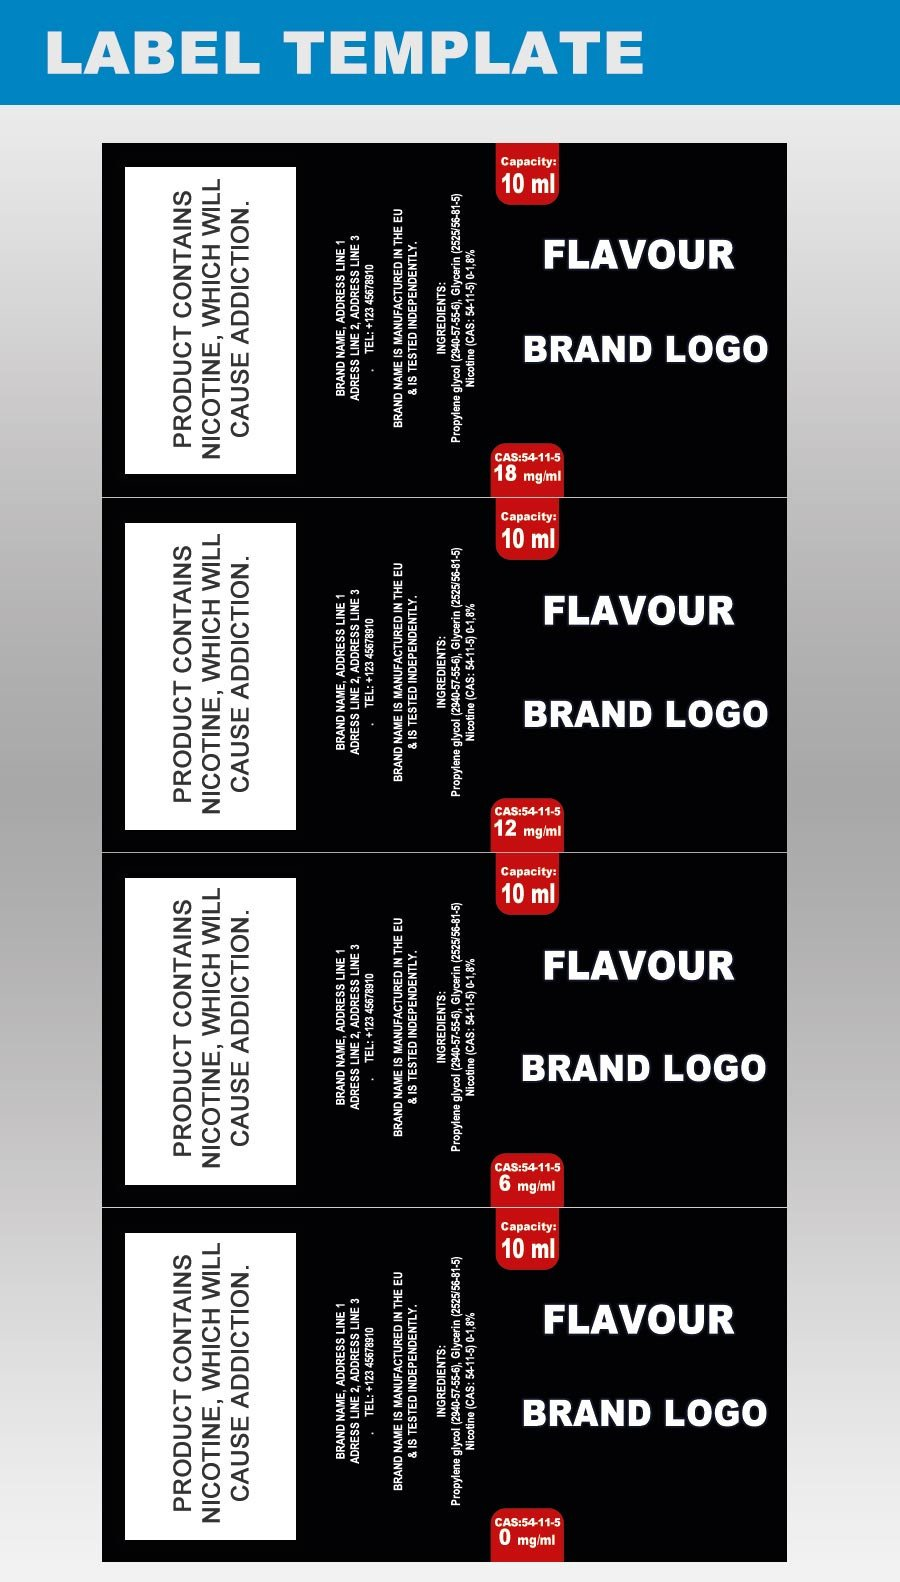 E Juice Bottle Label Template Design Packaging Templates for E Juice Labels